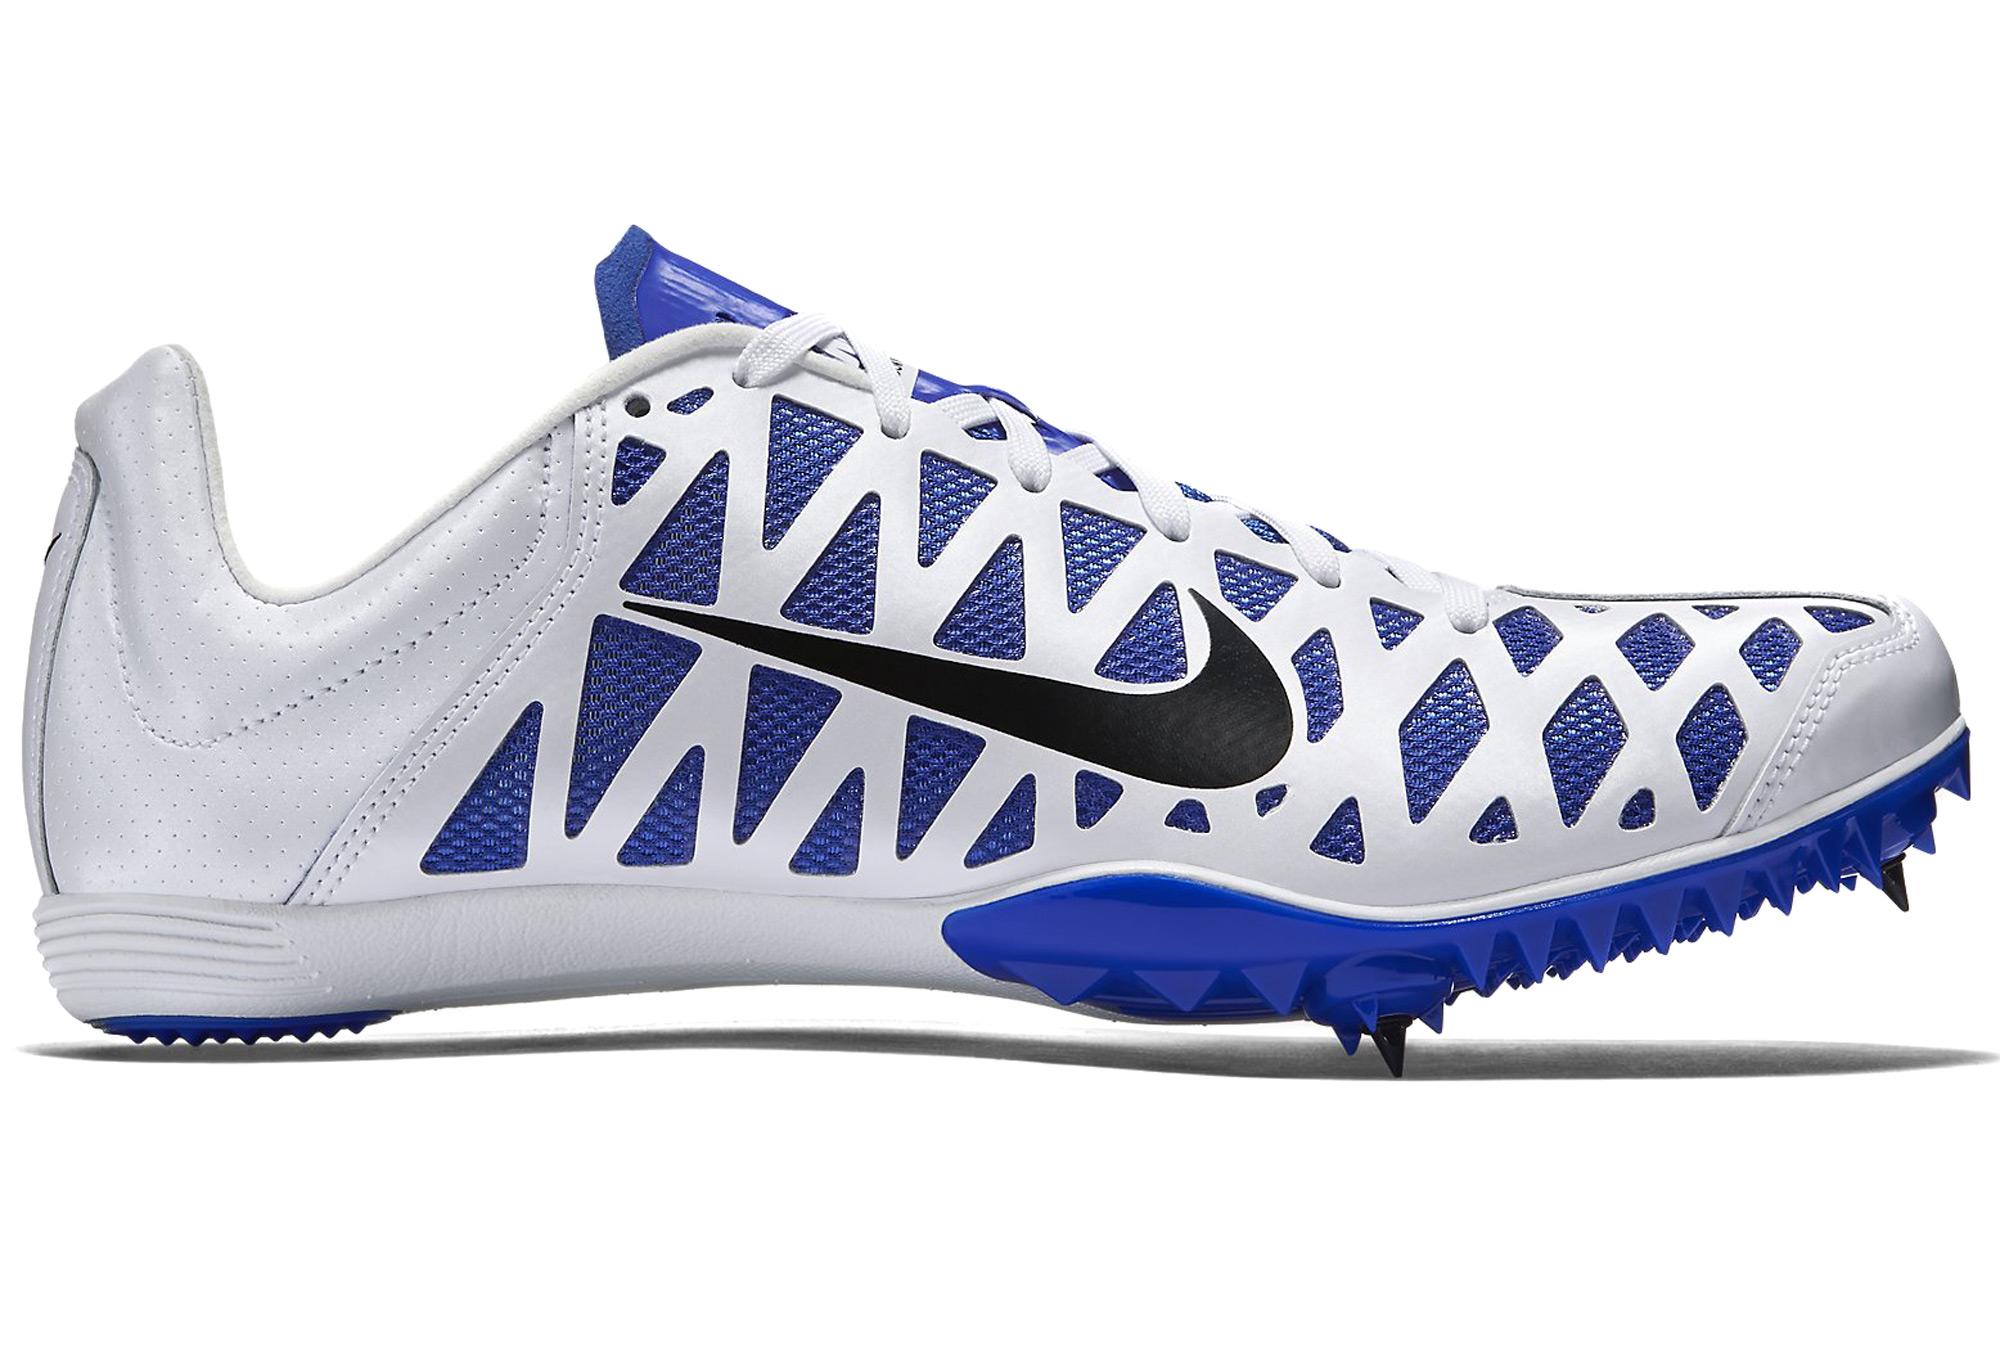 Chaussures d'Athlétisme Nike ZOOM MAXCAT 4 Blanc